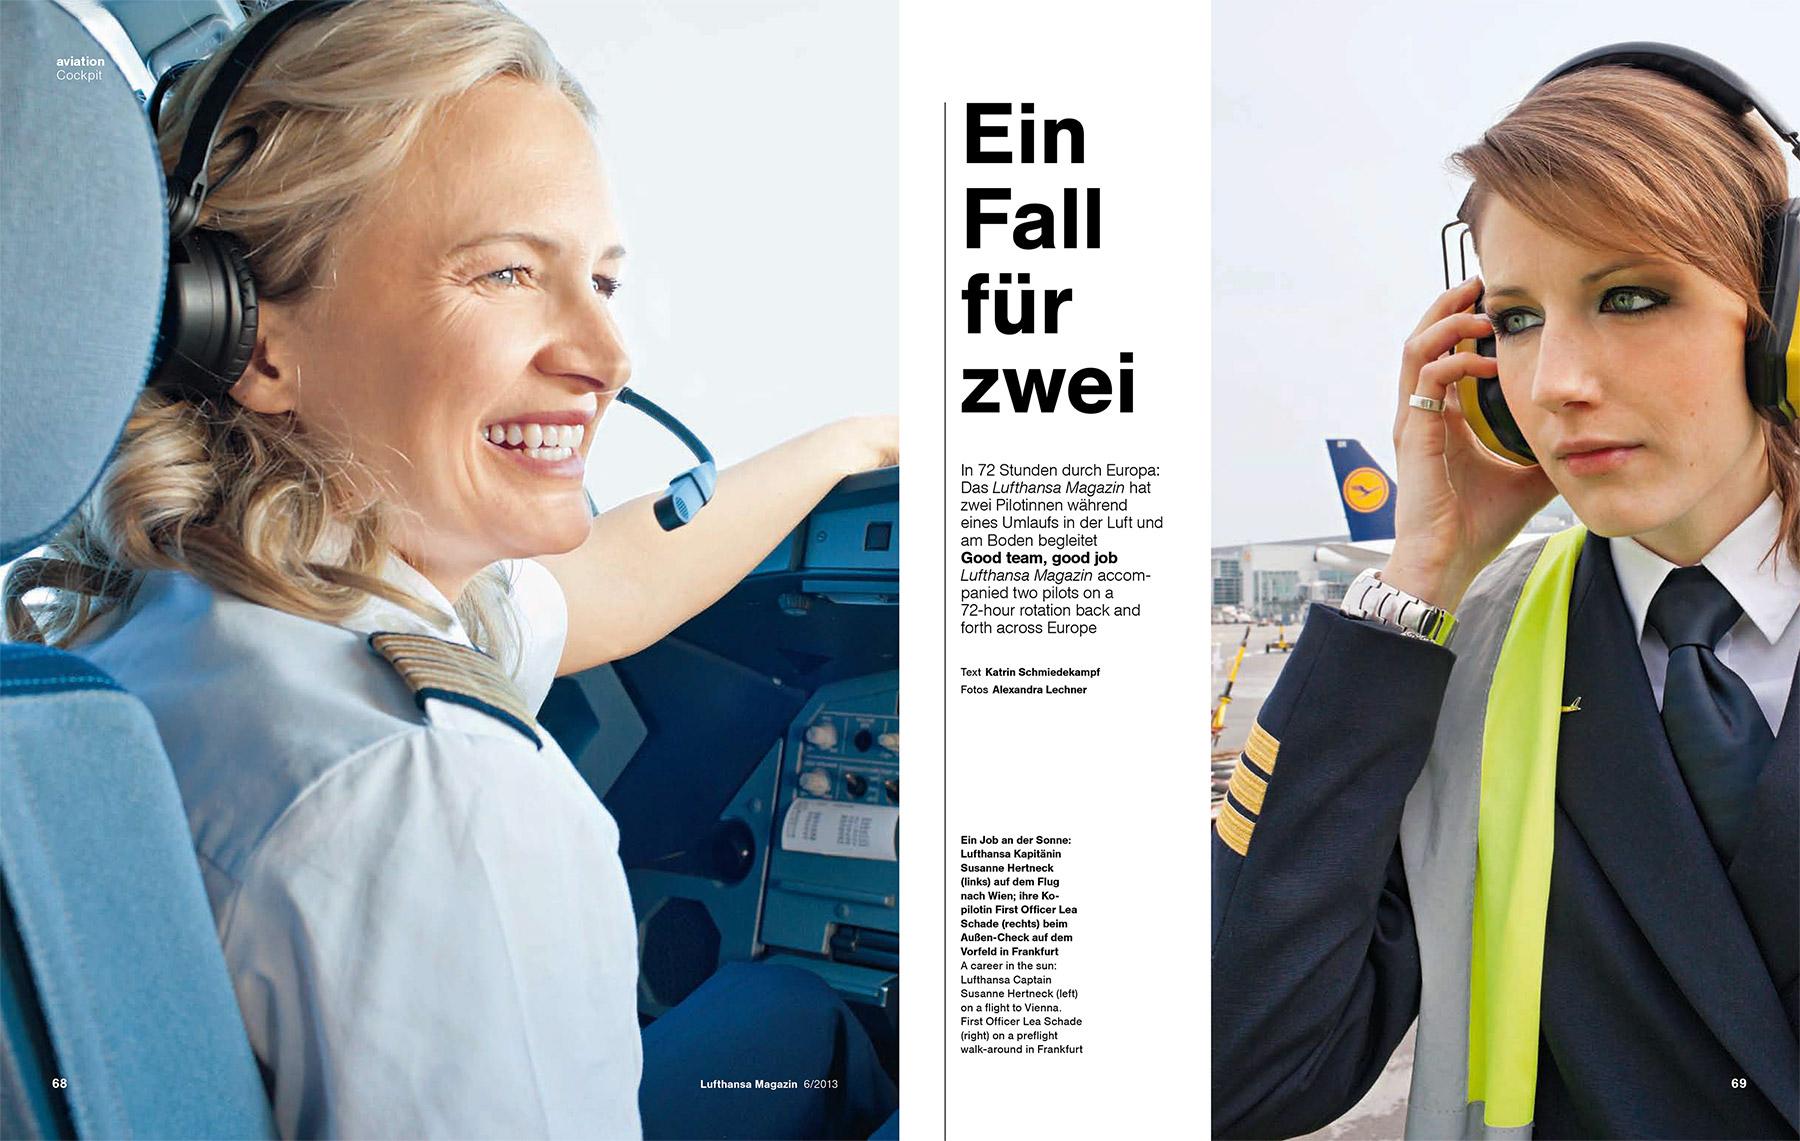 Businessfotografie Reportagefotografie Corporate Fotografie Business Portrait Pilotin